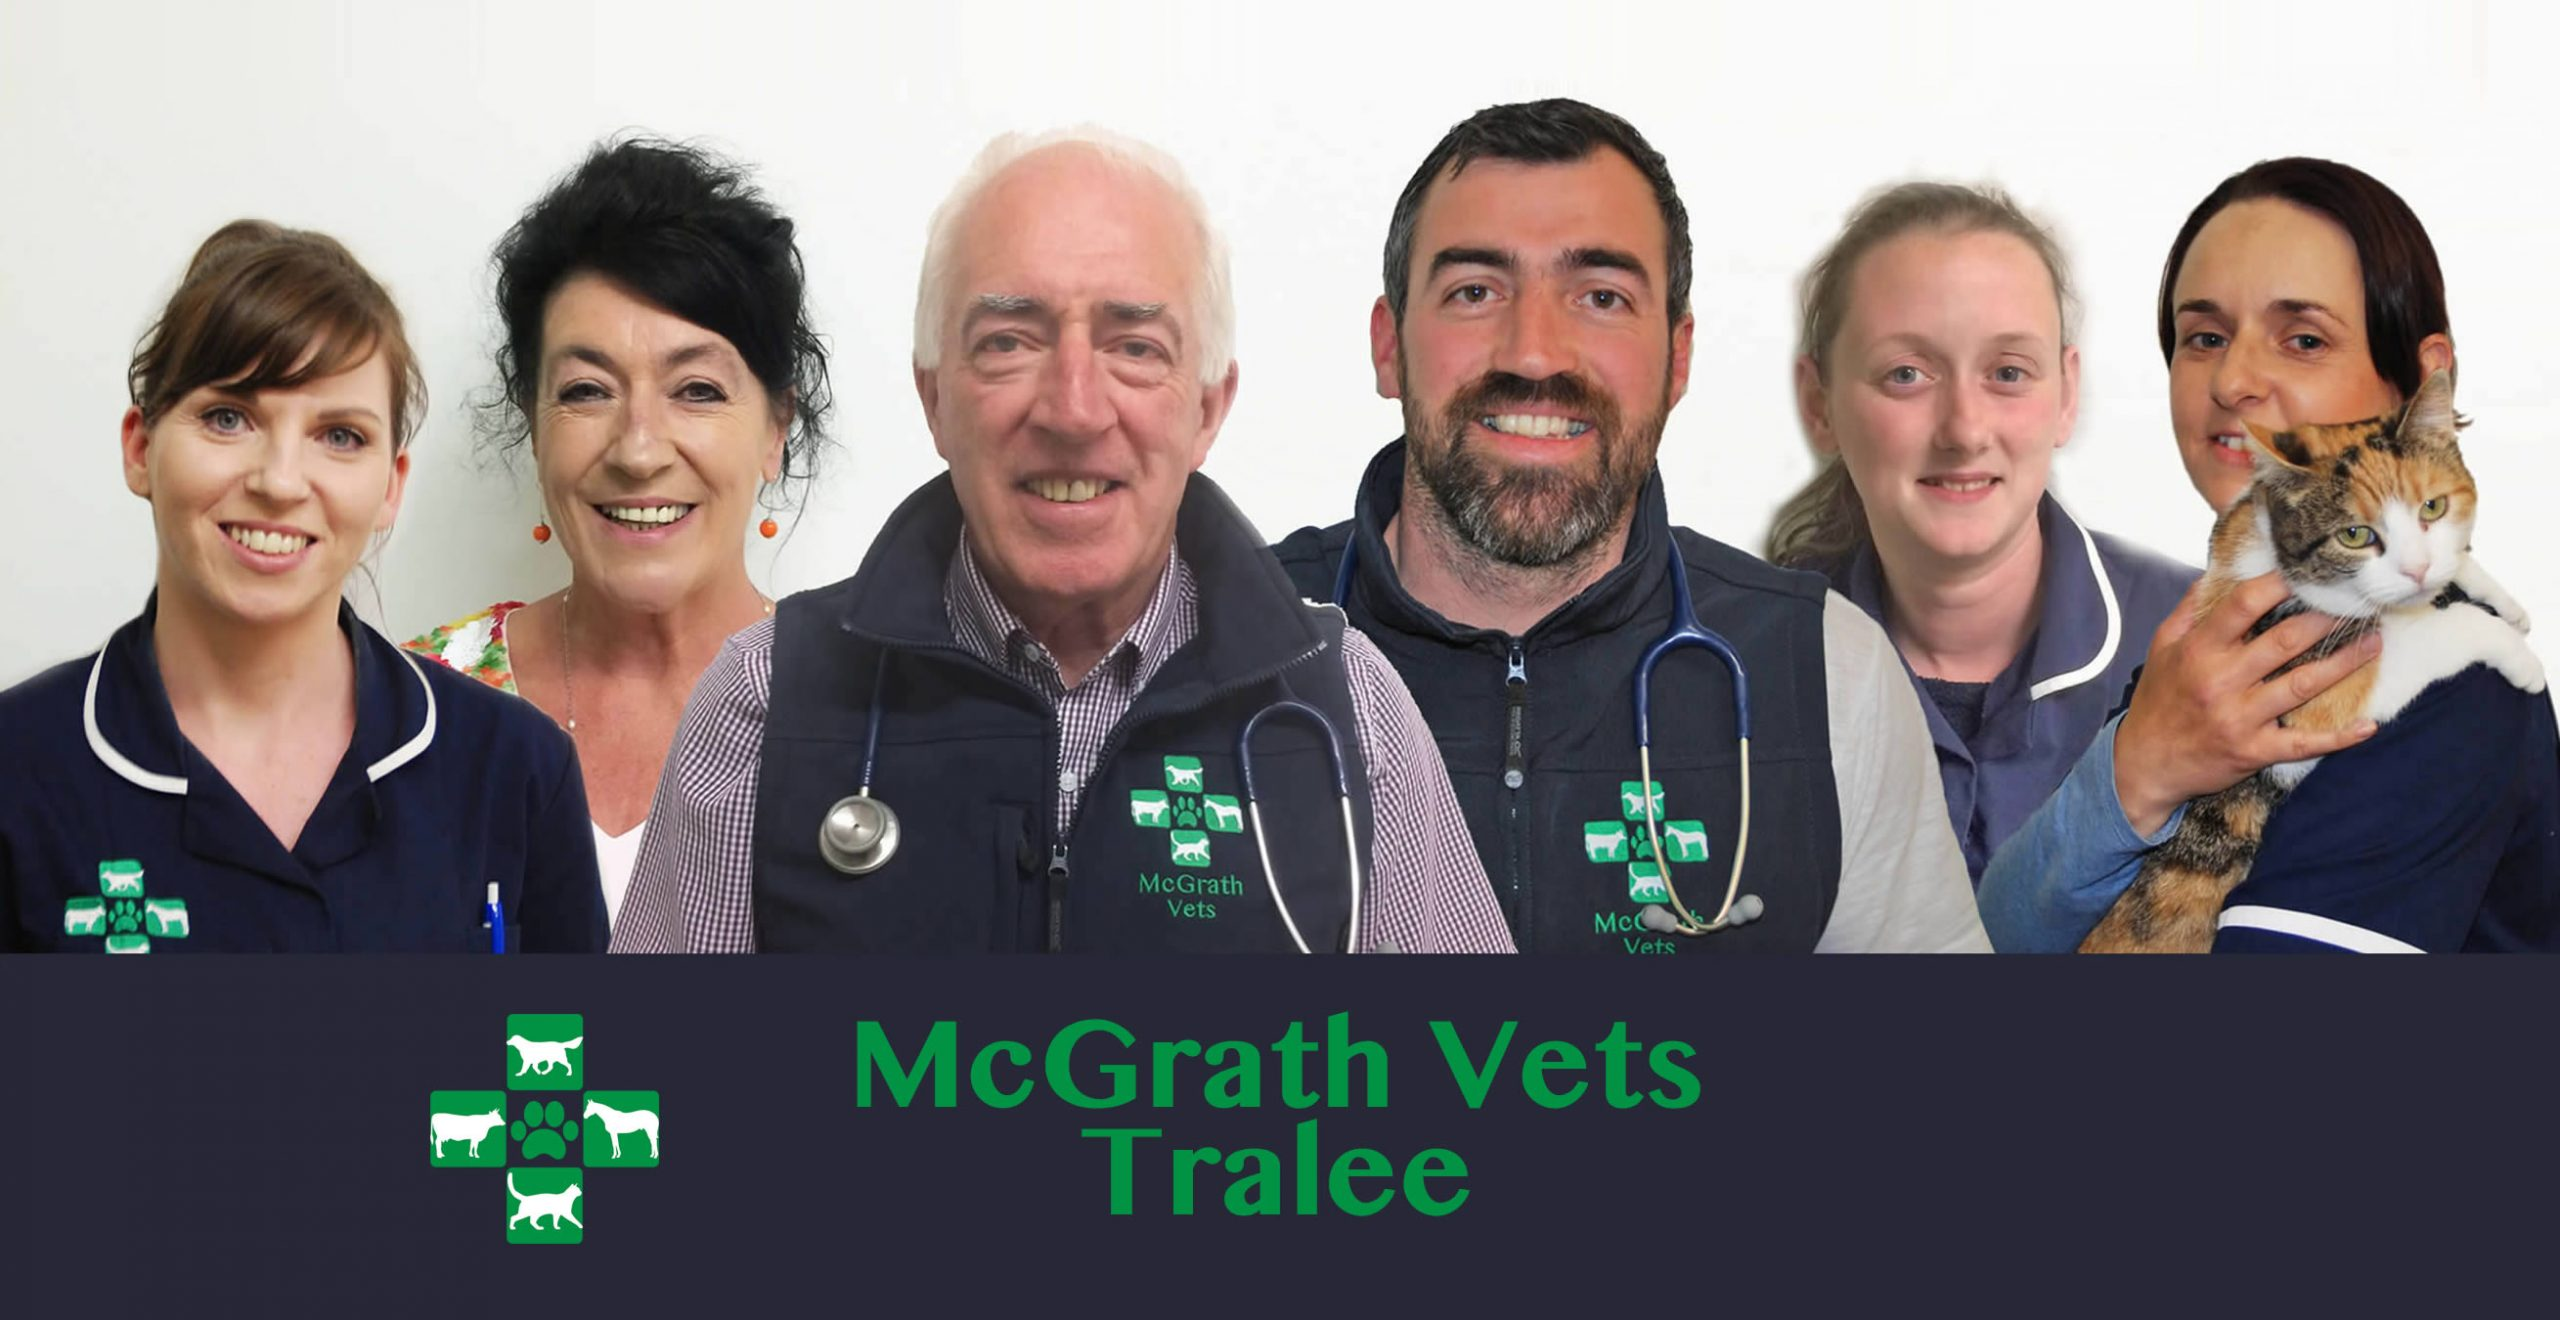 McGrath Vets Staff